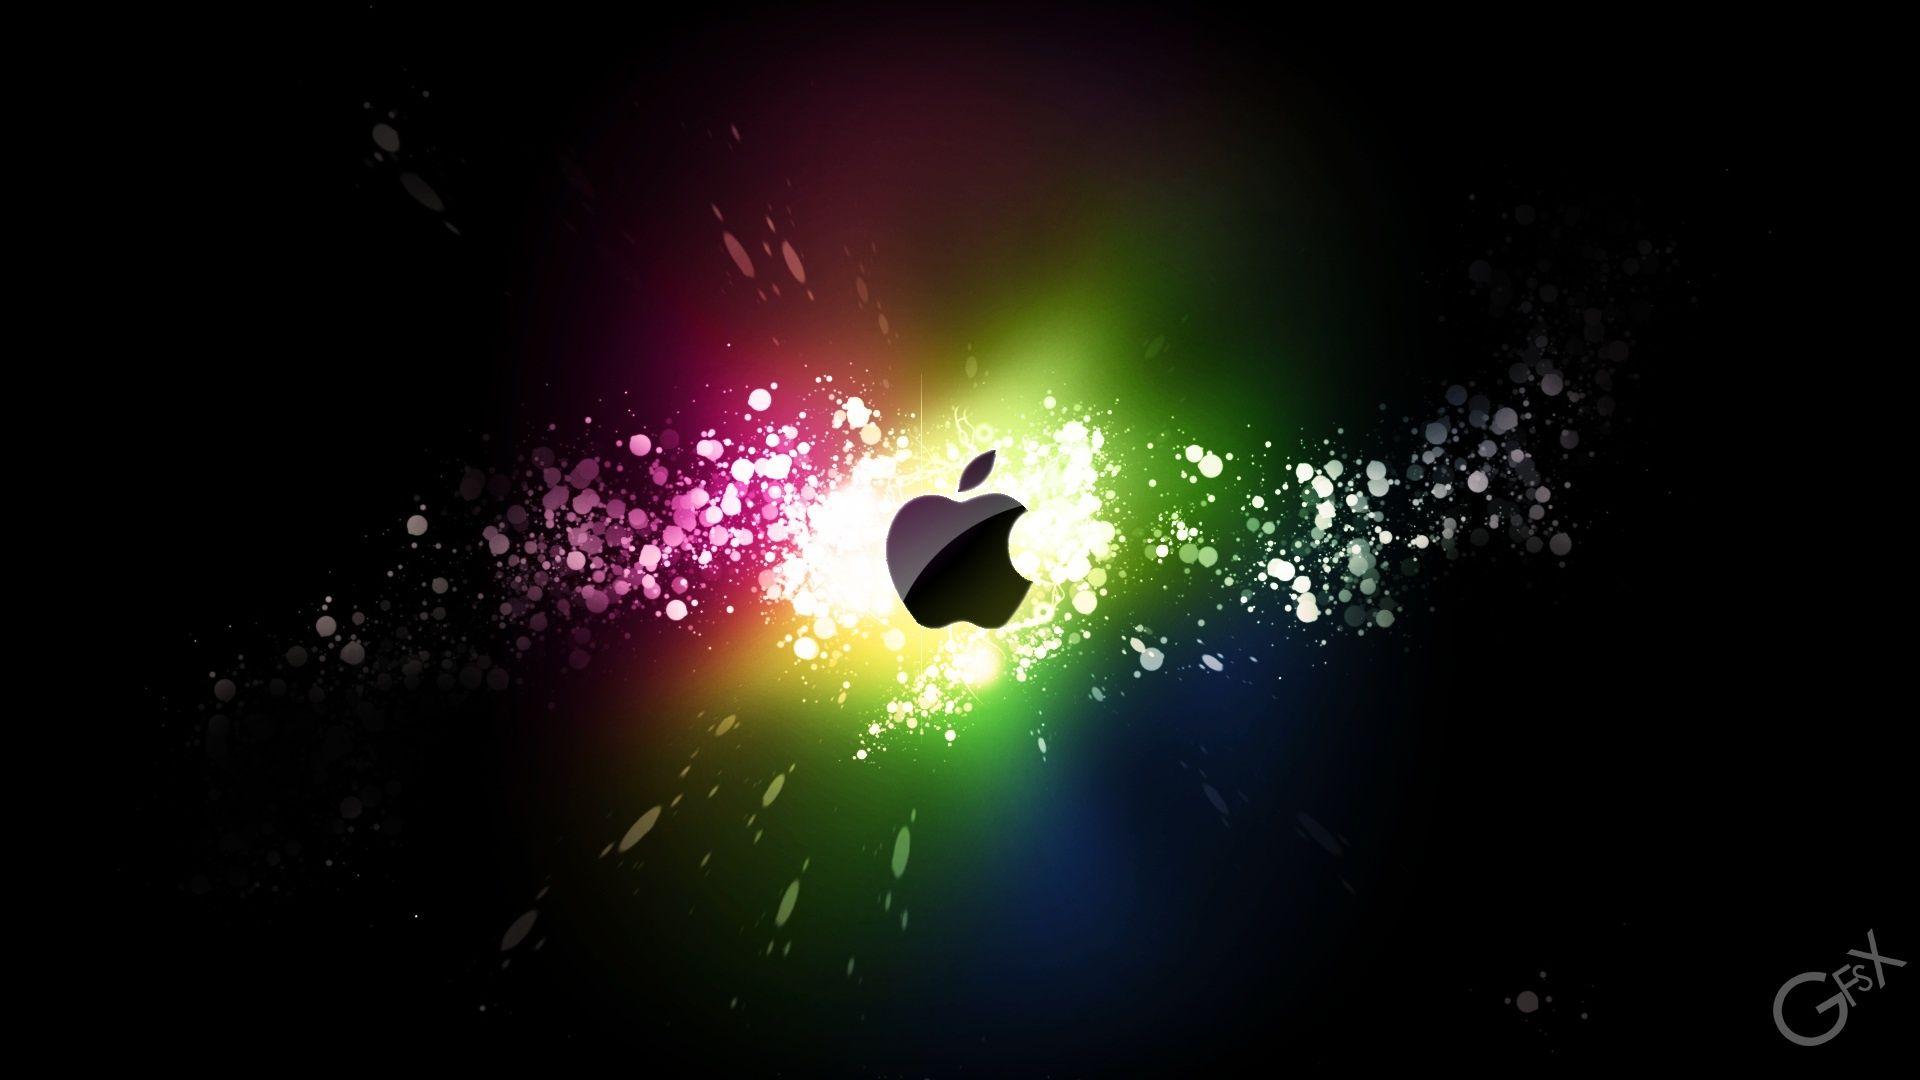 Apple Wallpaper For Windows 7 Hd Apple Logo Wallpaper Mac Wallpaper Cool Screensavers